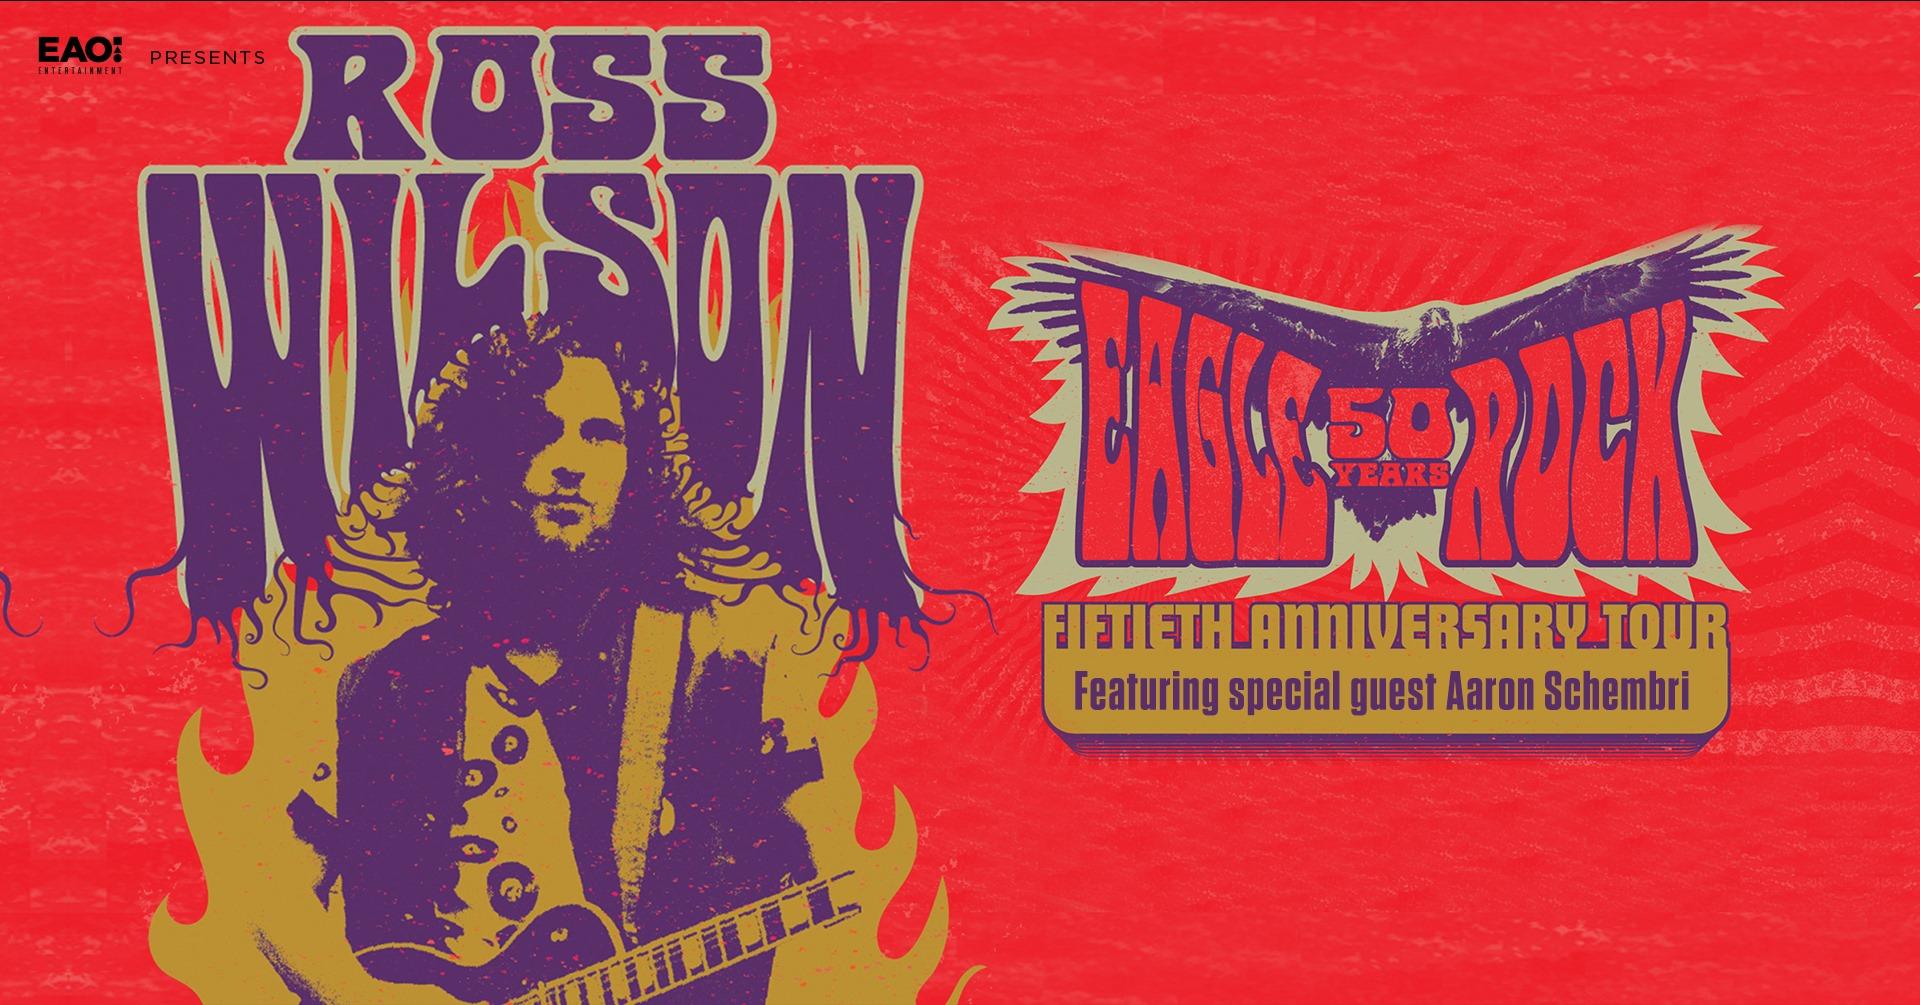 Ross Wilson – 50 Years of Eagle Rock!